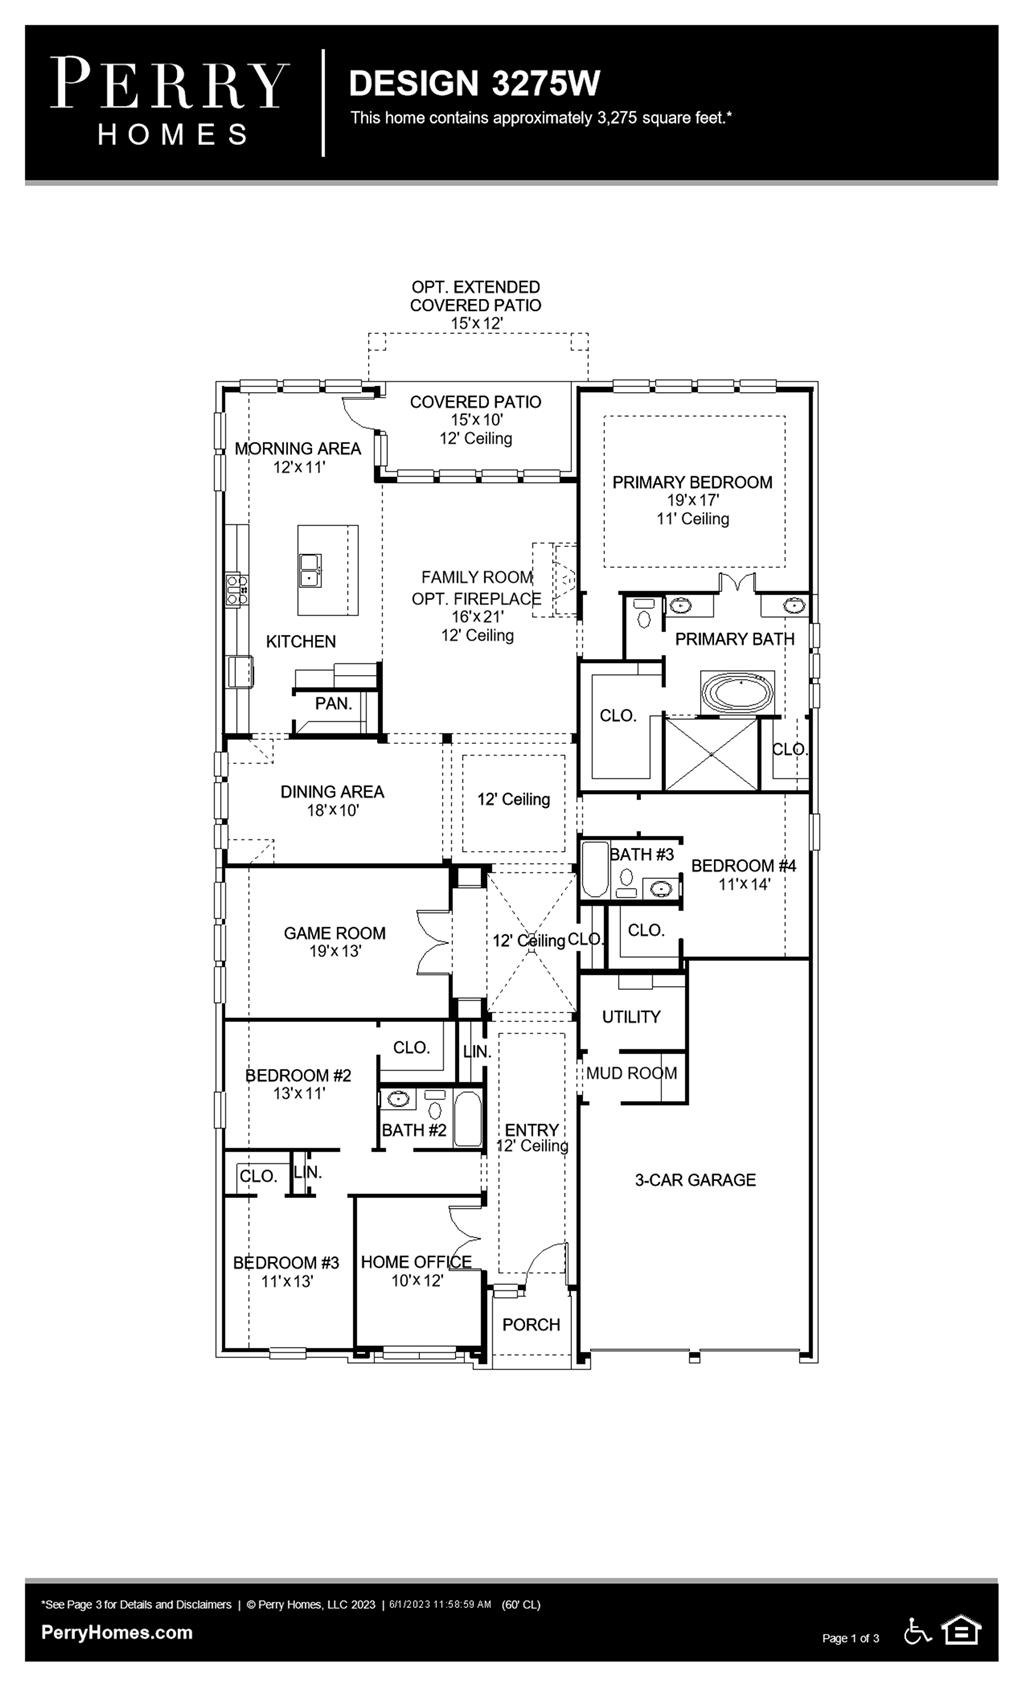 Floor Plan for 3275W